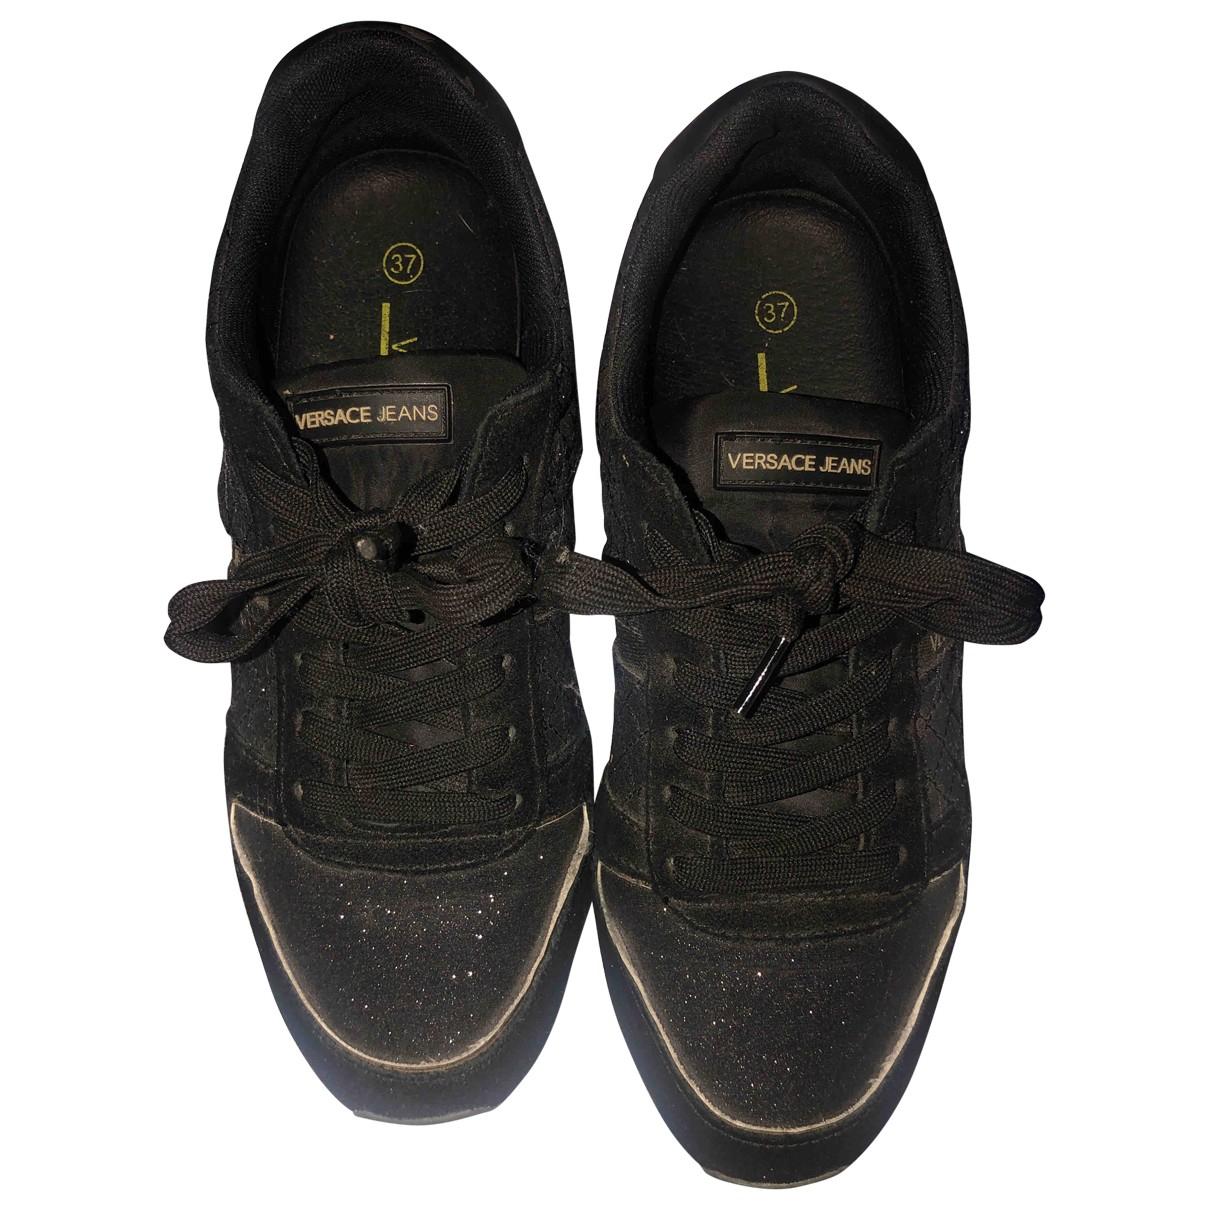 Versace Jeans N Black Glitter Trainers for Women 37 EU